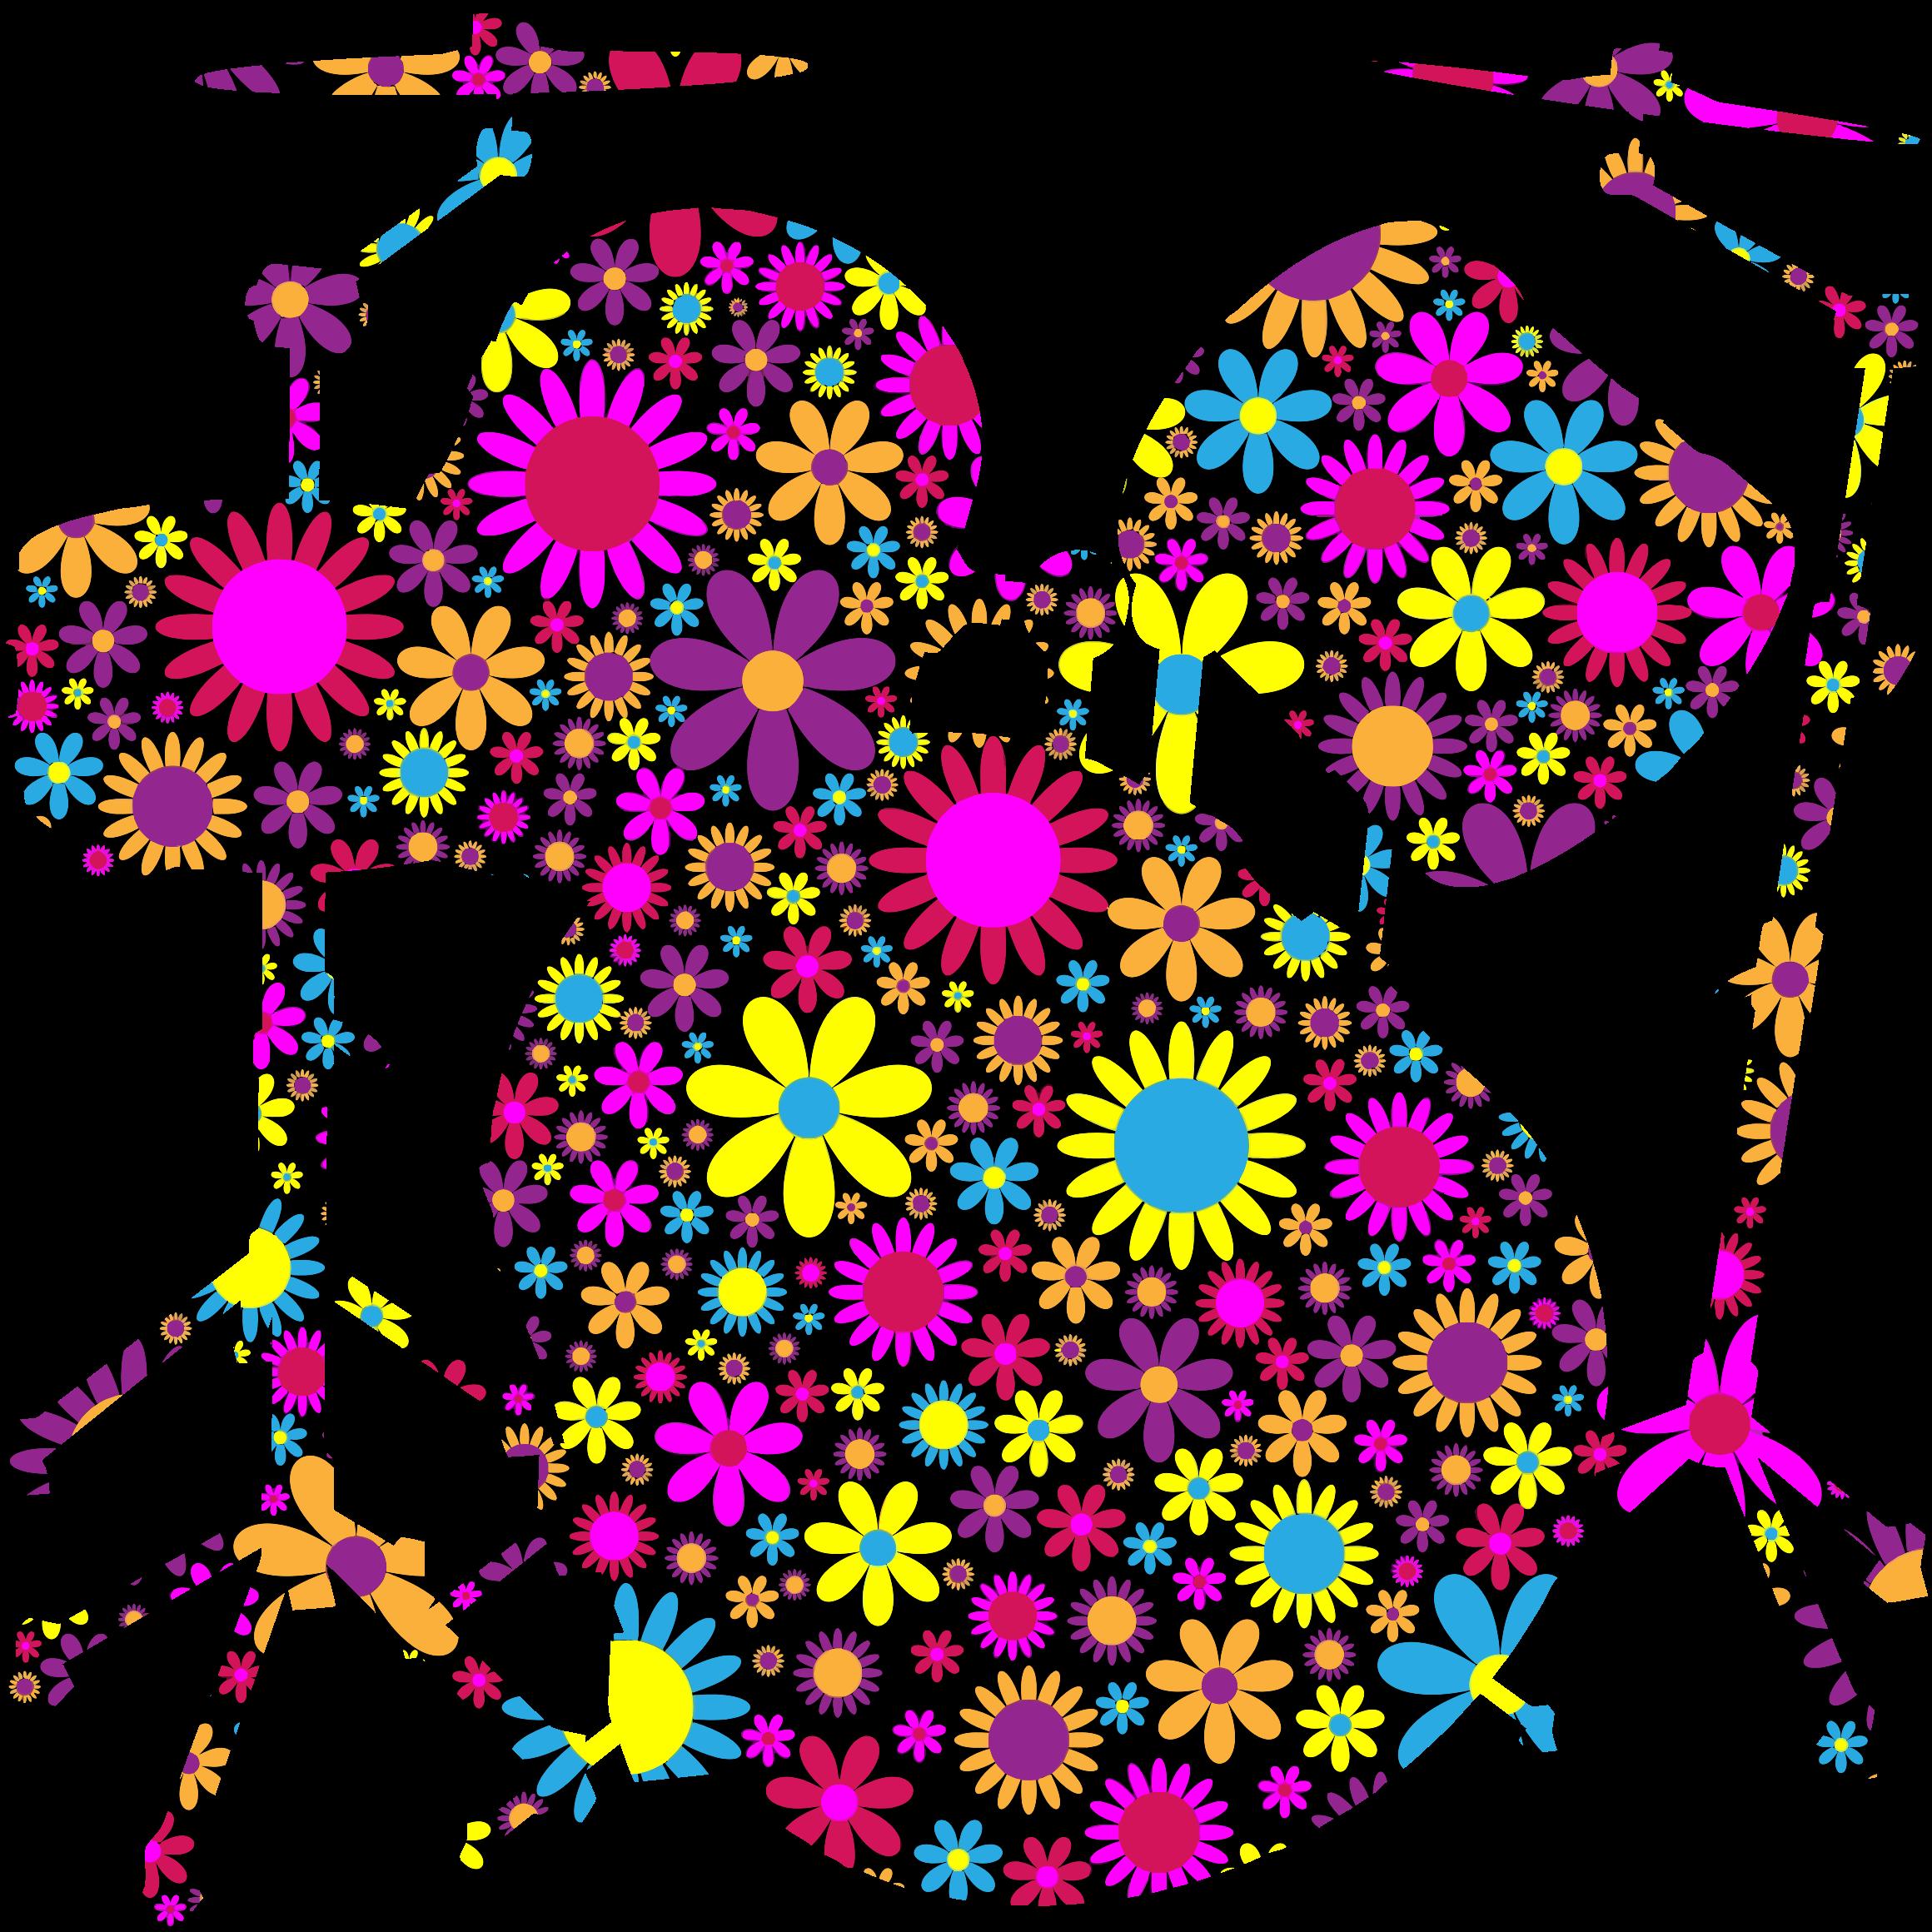 Floral big image png. Silhouette clipart drum set